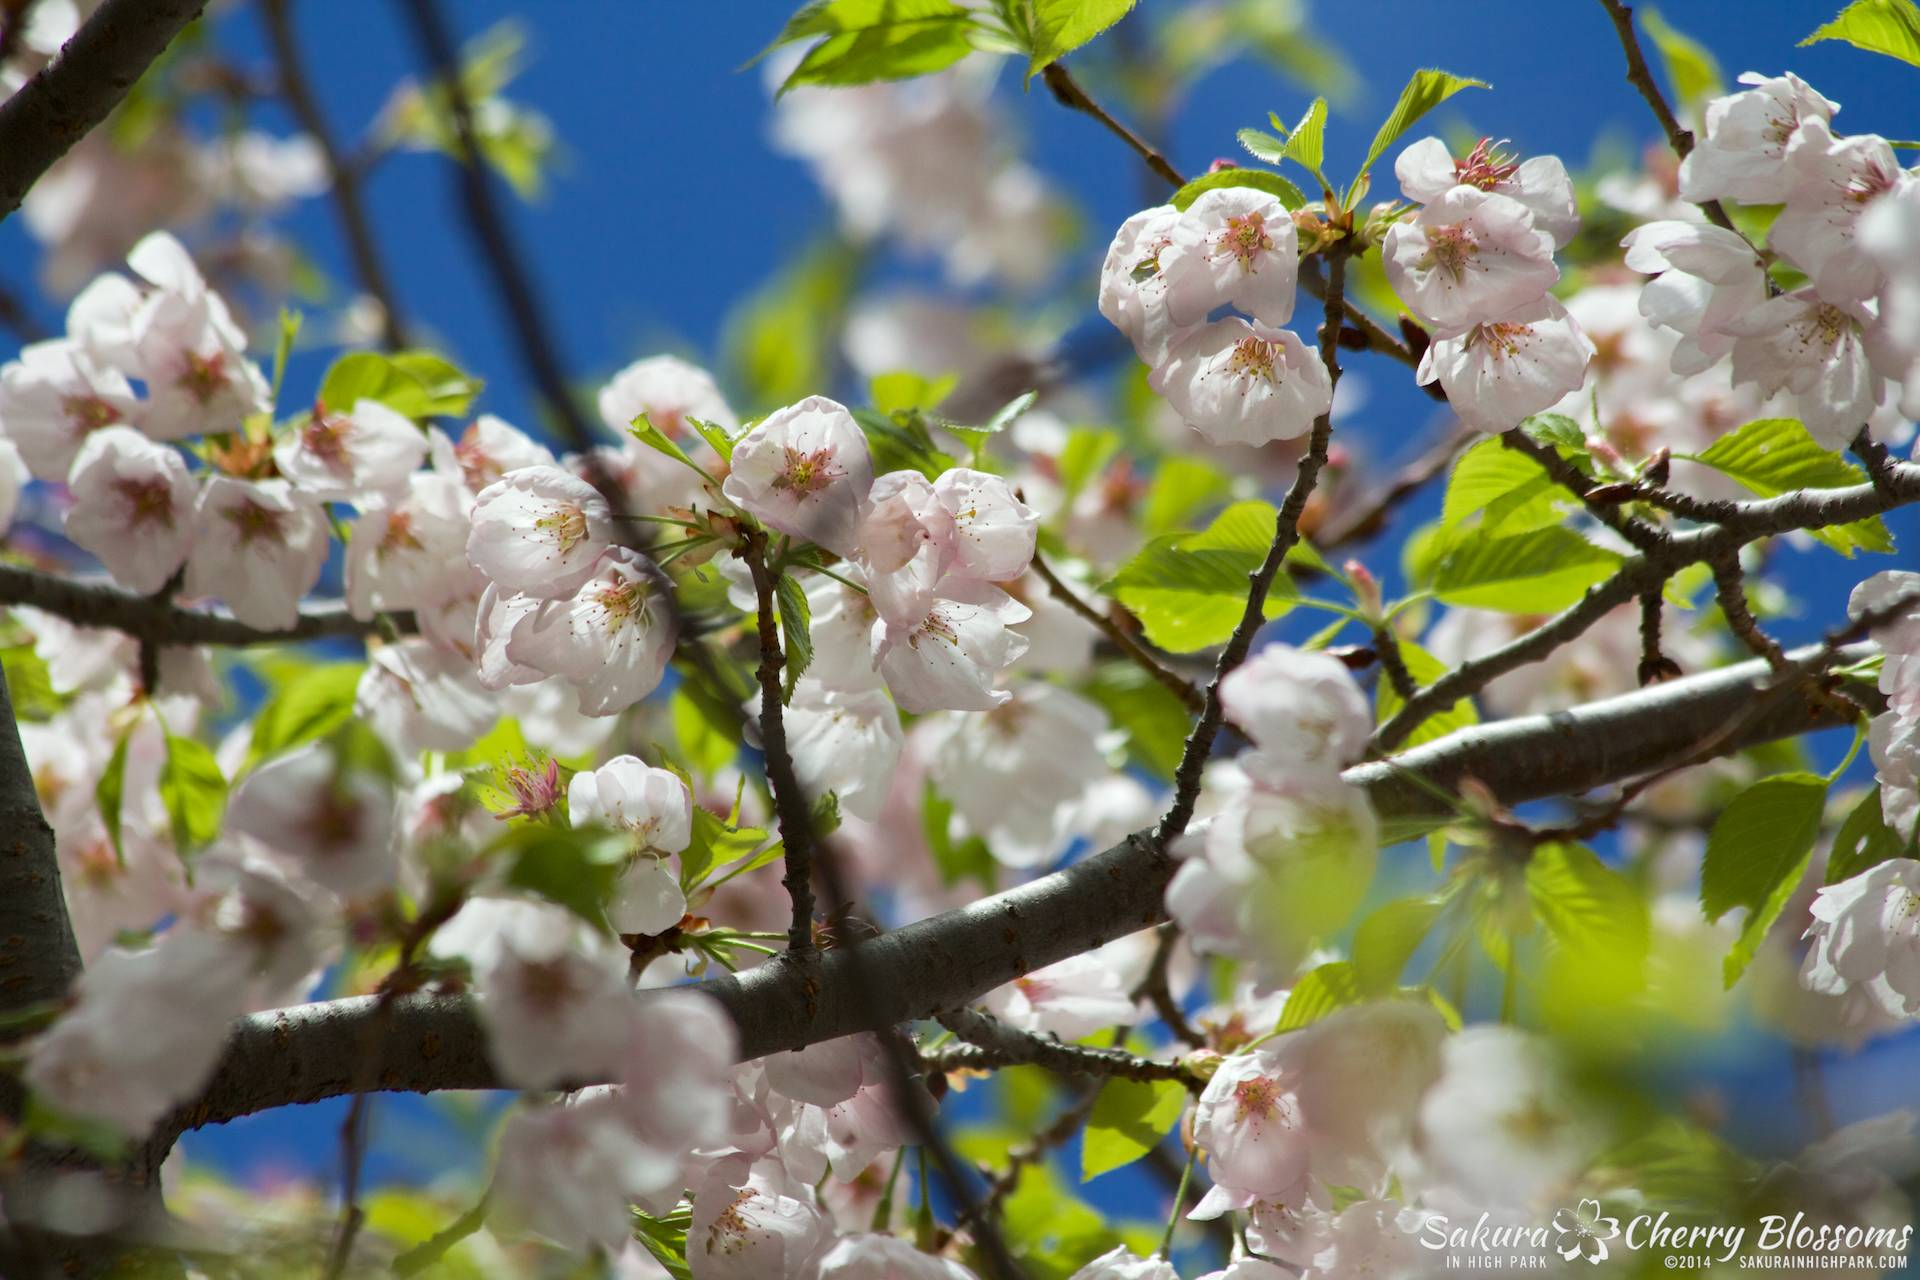 SakuraInHighPark-May1614-648.jpg